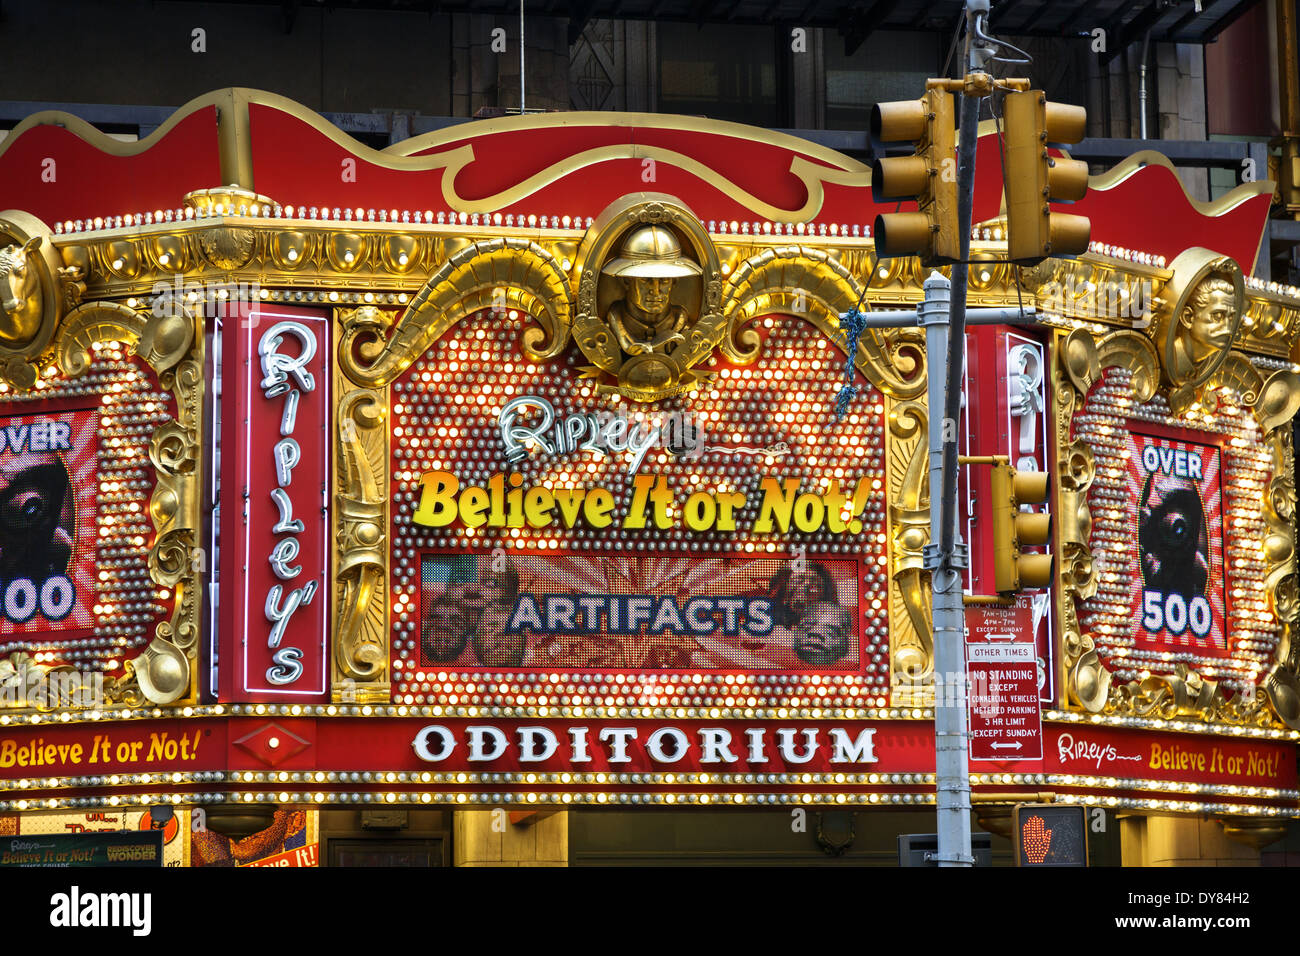 Ripley s believe it or not odditorium west 42nd street new york